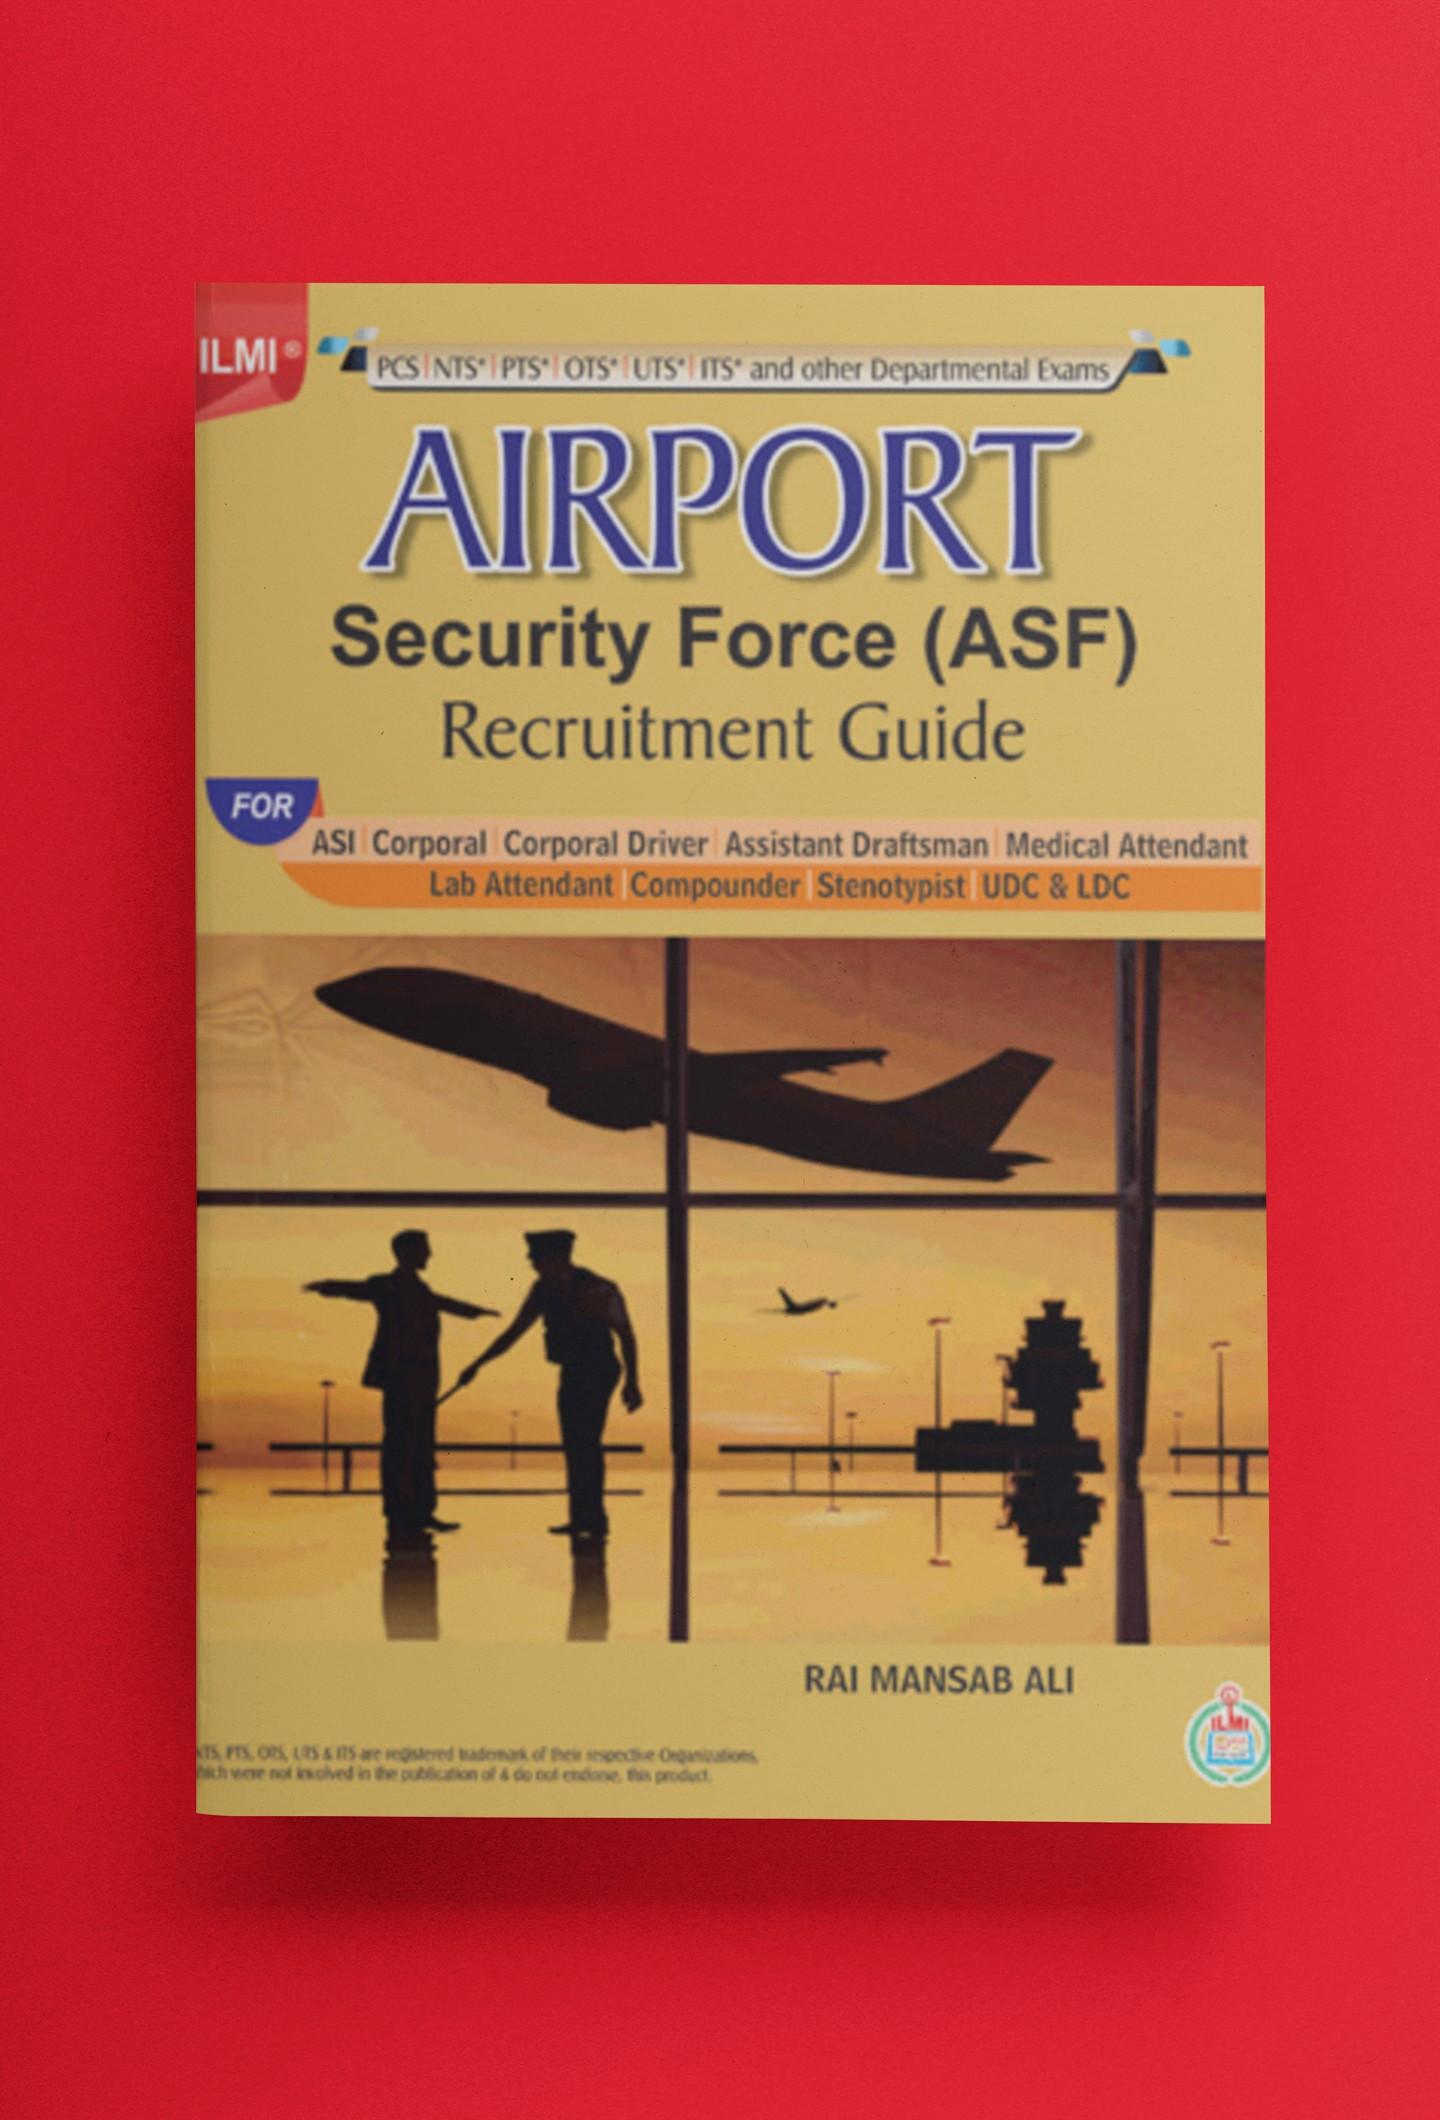 Airpilot recruitment guide